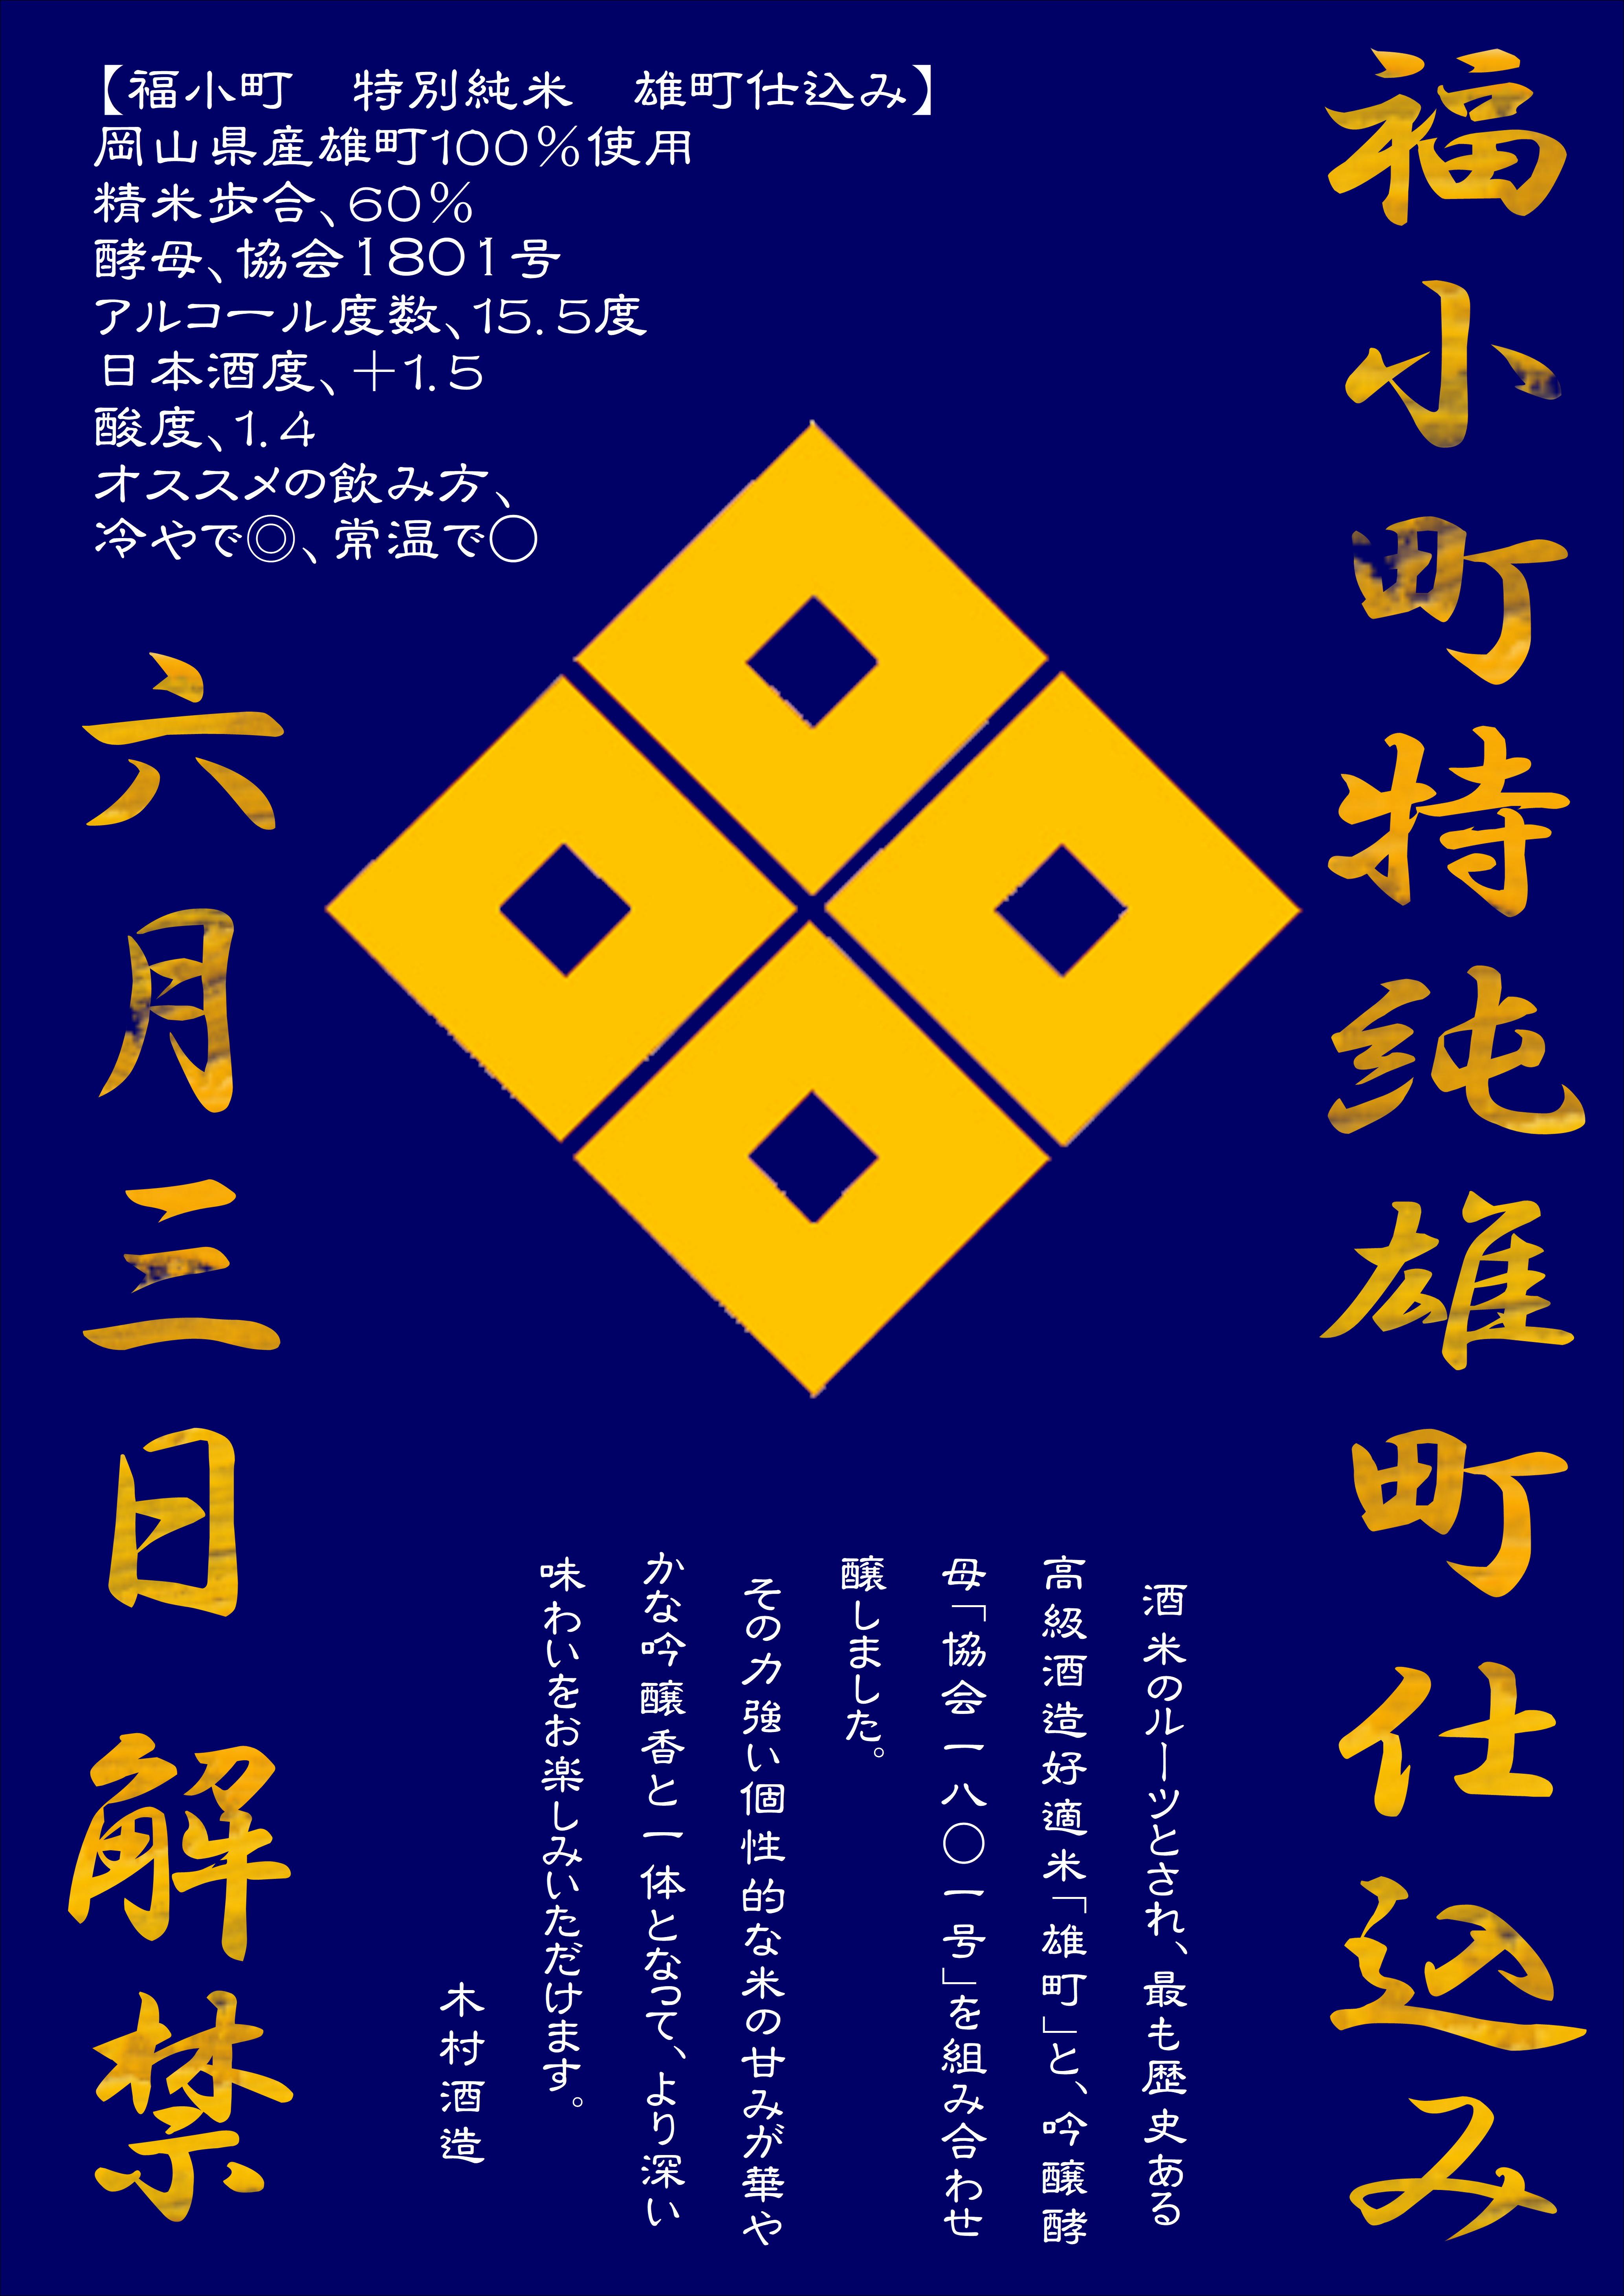 http://www.fukukomachi.com/blog/photo/20200521.JPG